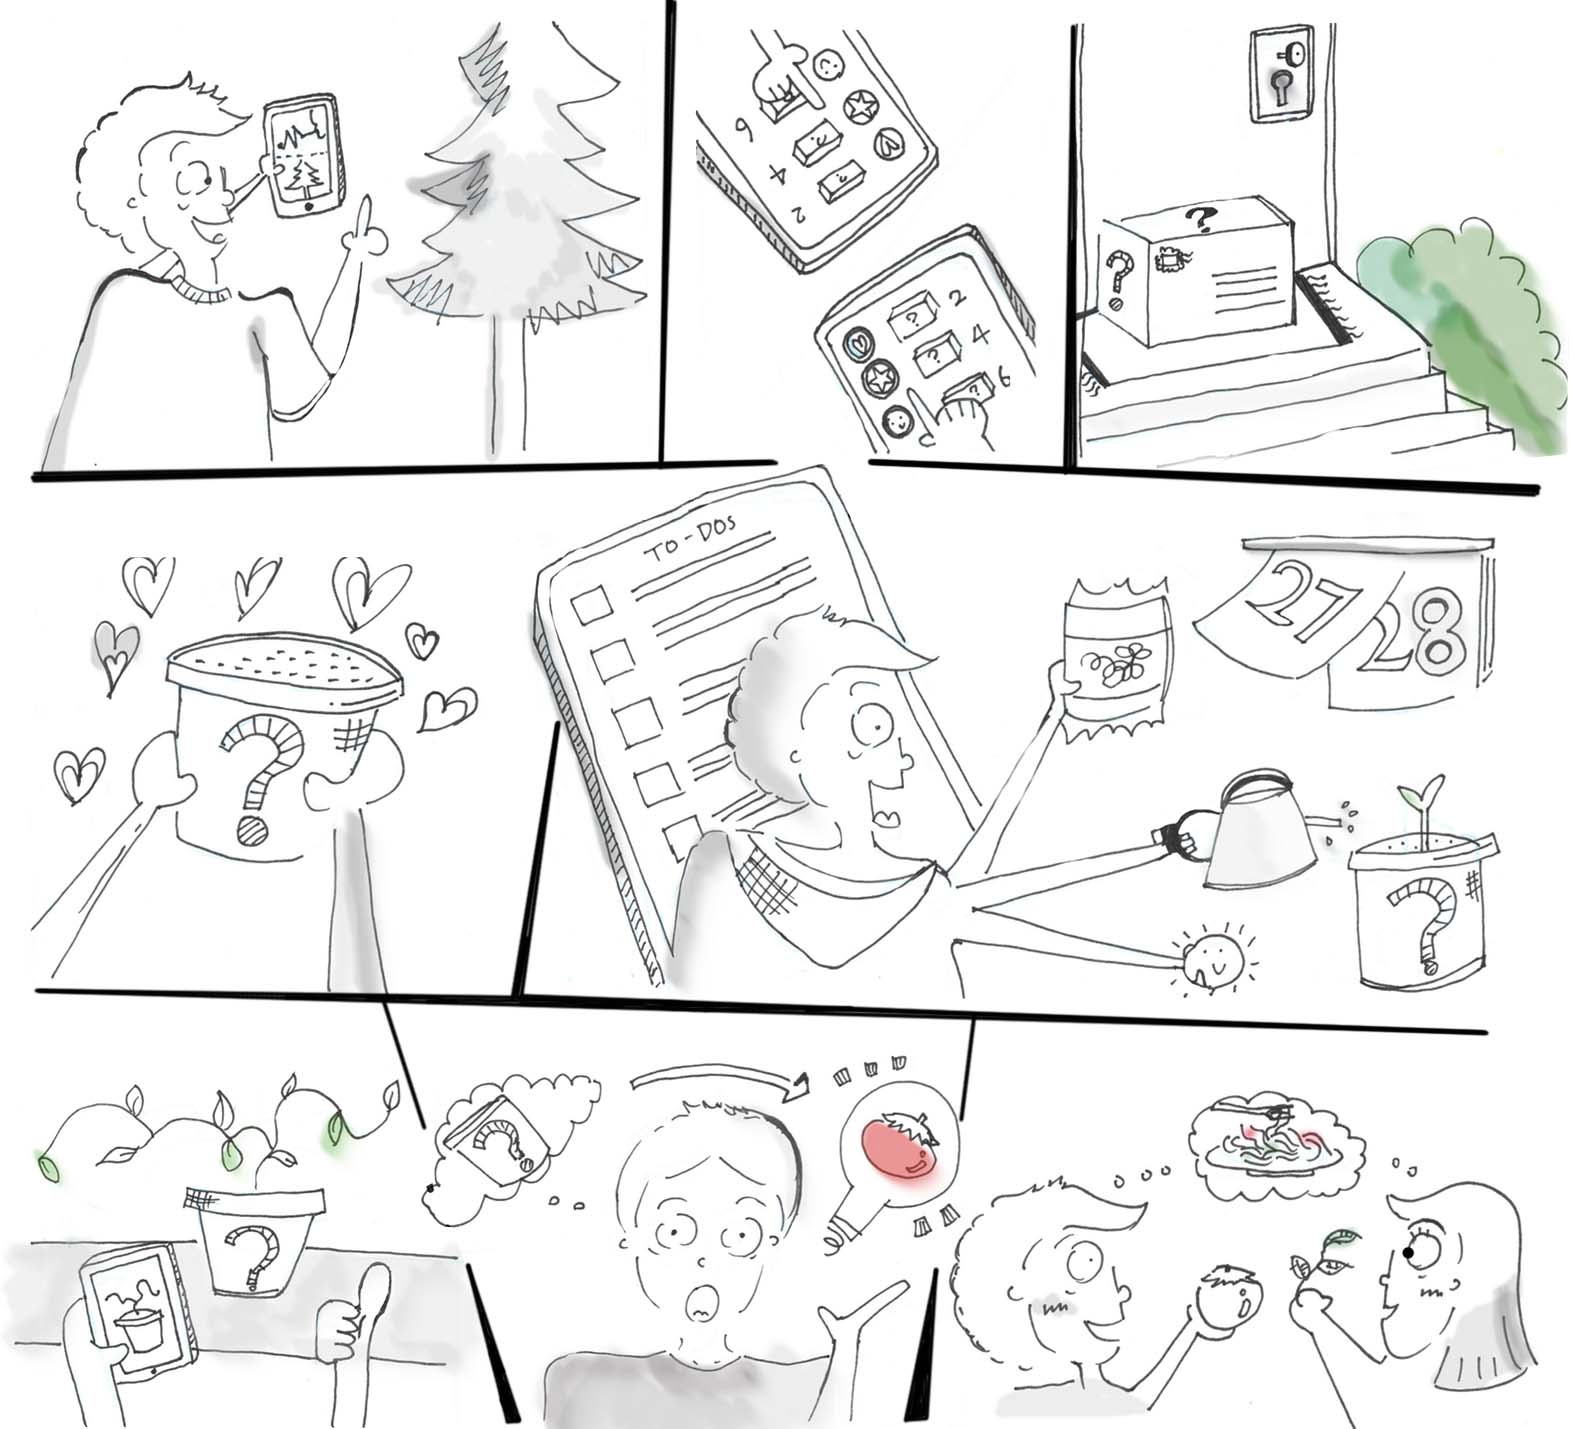 Initial Storyboard